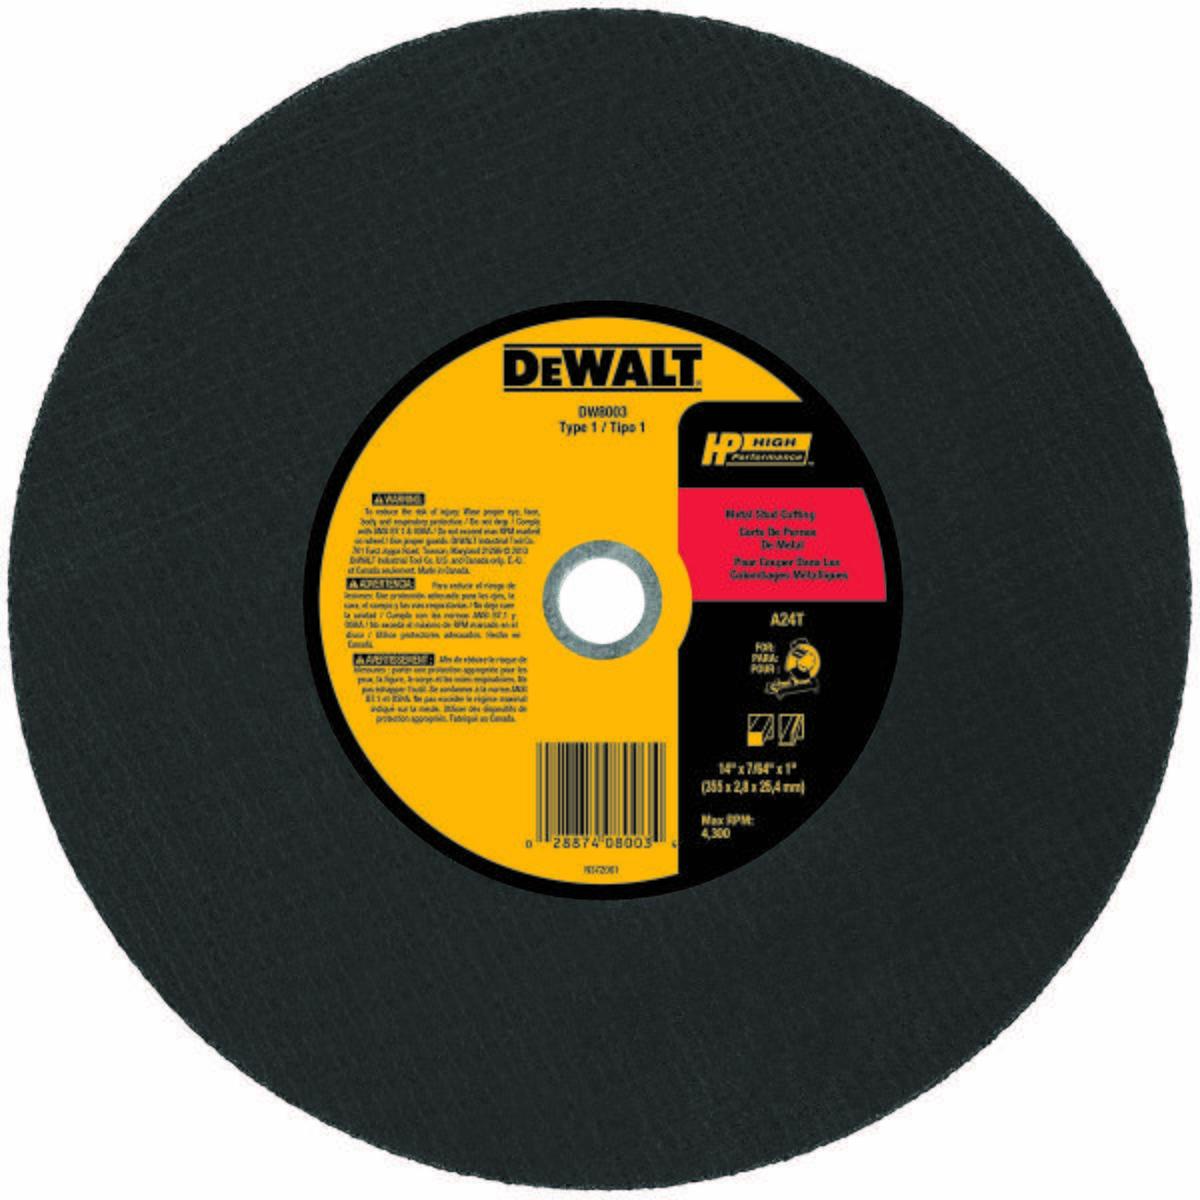 Abrasive Cut-Off Wheel, Abrasive Wheel Type Type 1, Abrasive Wheel Diameter 14 In., Thickness 7/64 In., Arbor Hole Size 1 In.